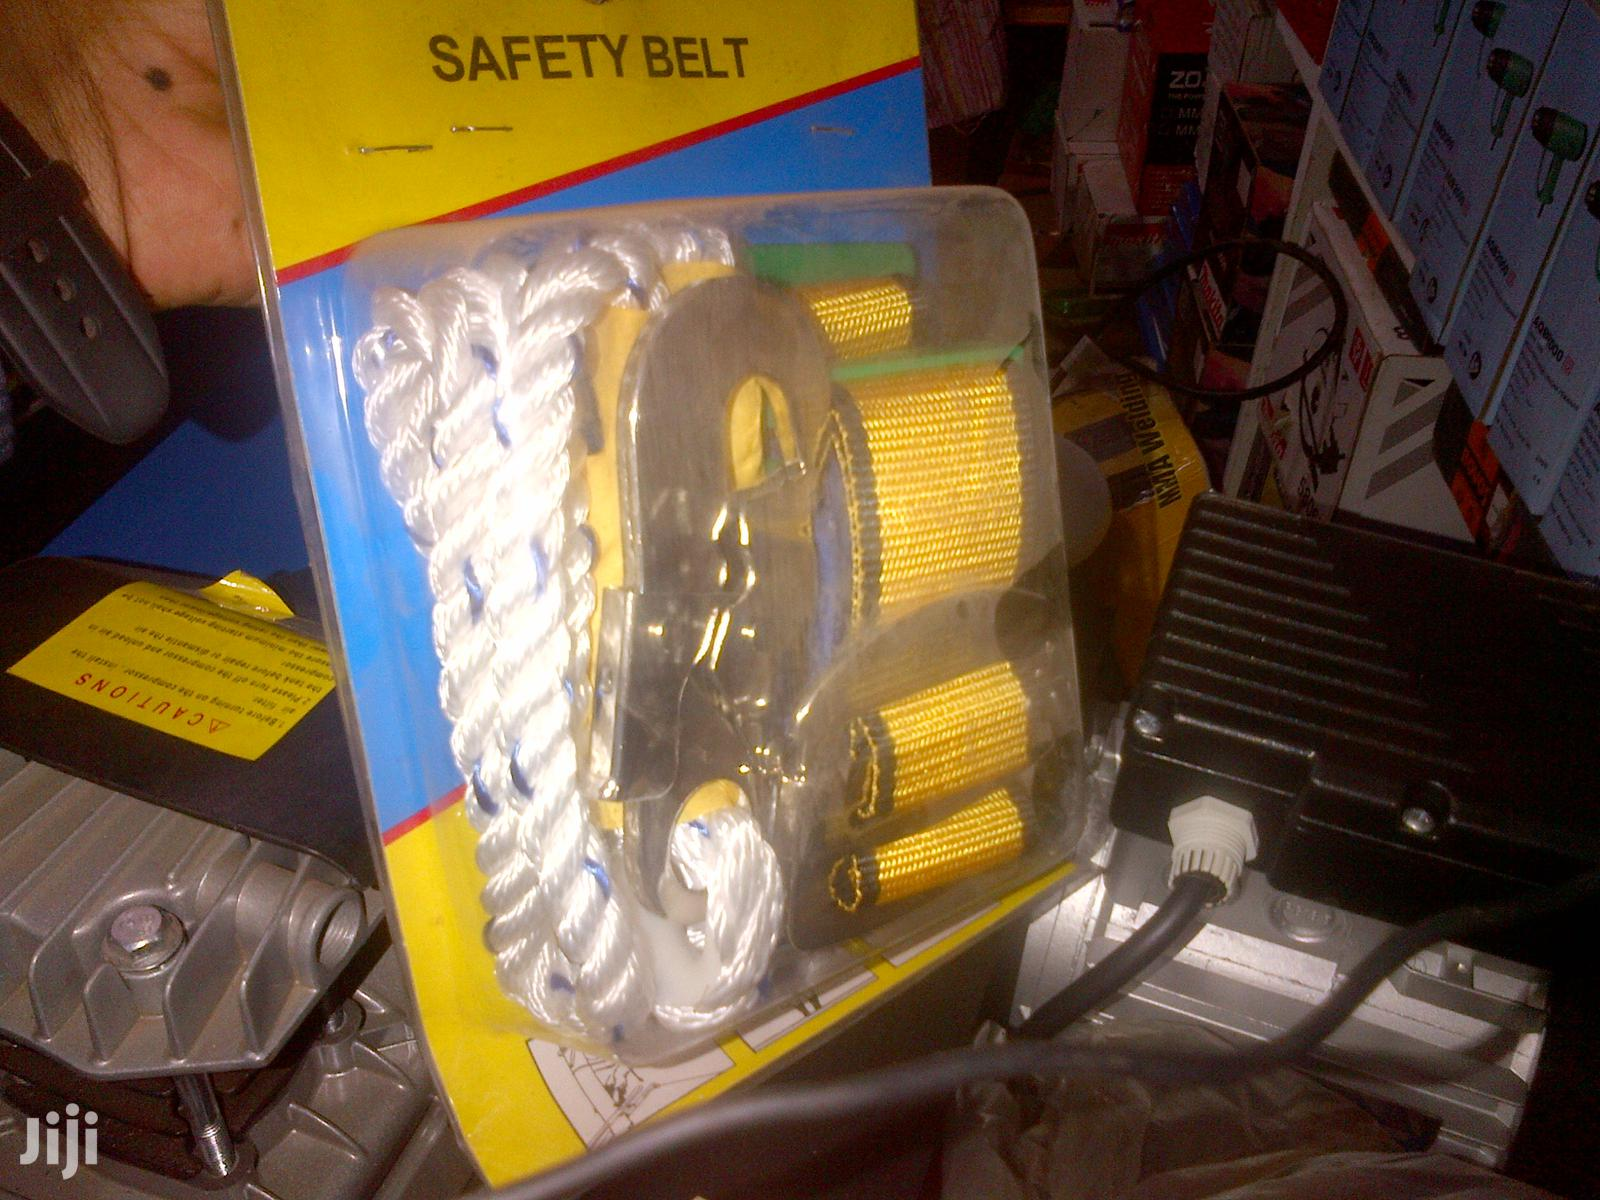 Safety Harness Belt RSI 8877 | Safetywear & Equipment for sale in Kampala, Uganda